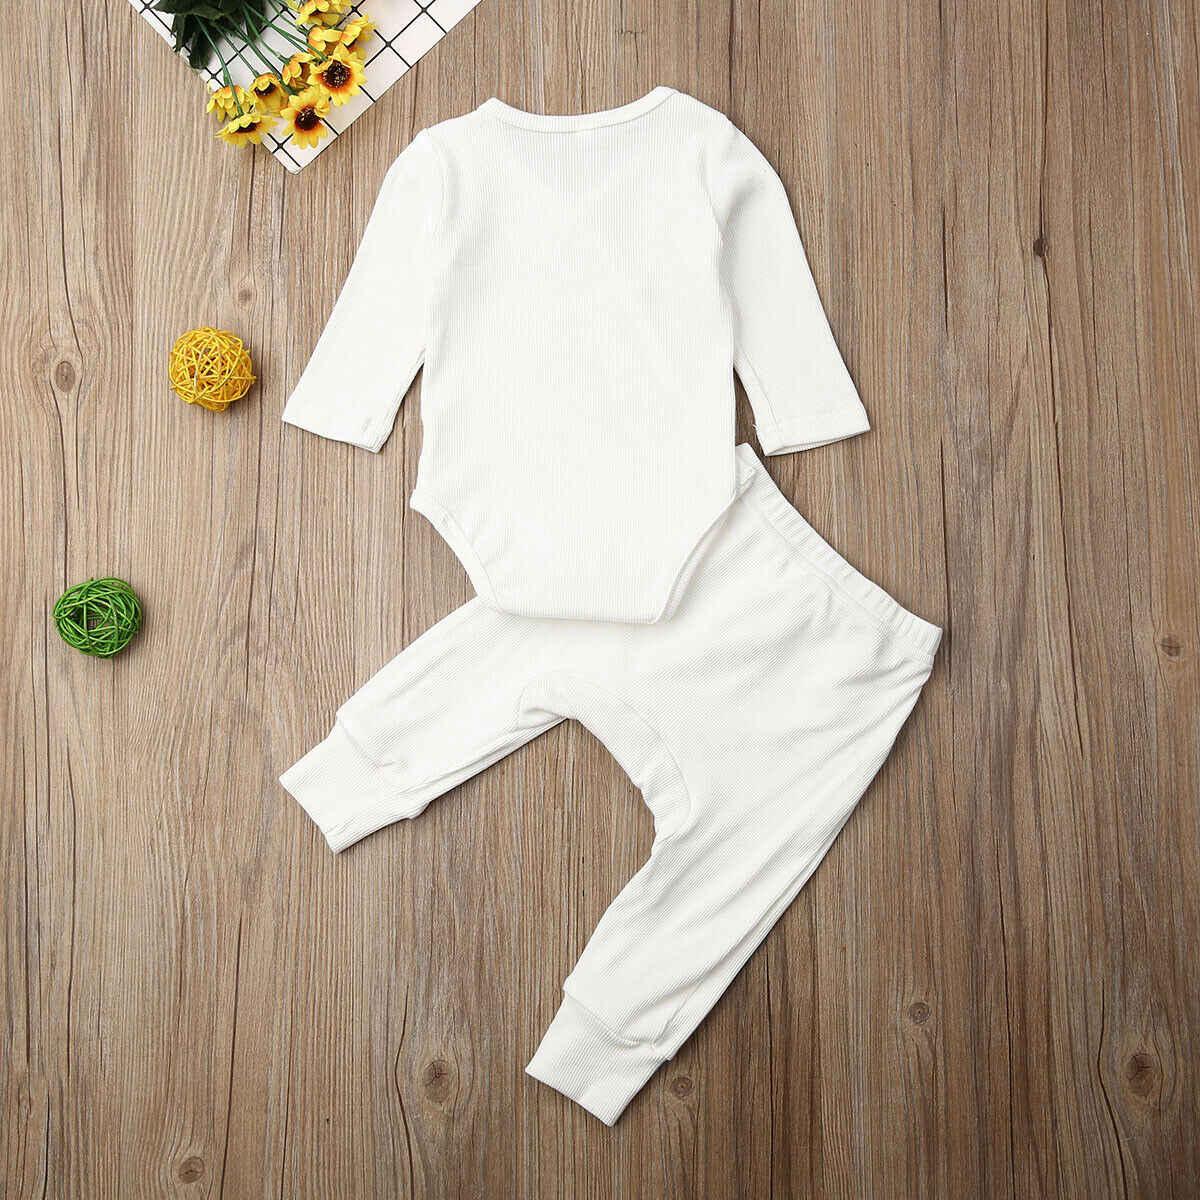 2019 Baby Frühling Herbst Kleidung Infant Infant Baby Junge Mädchen Kleidung Winter Langarm Tops Hosen Outfits 2Pcs Sets trainingsanzüge